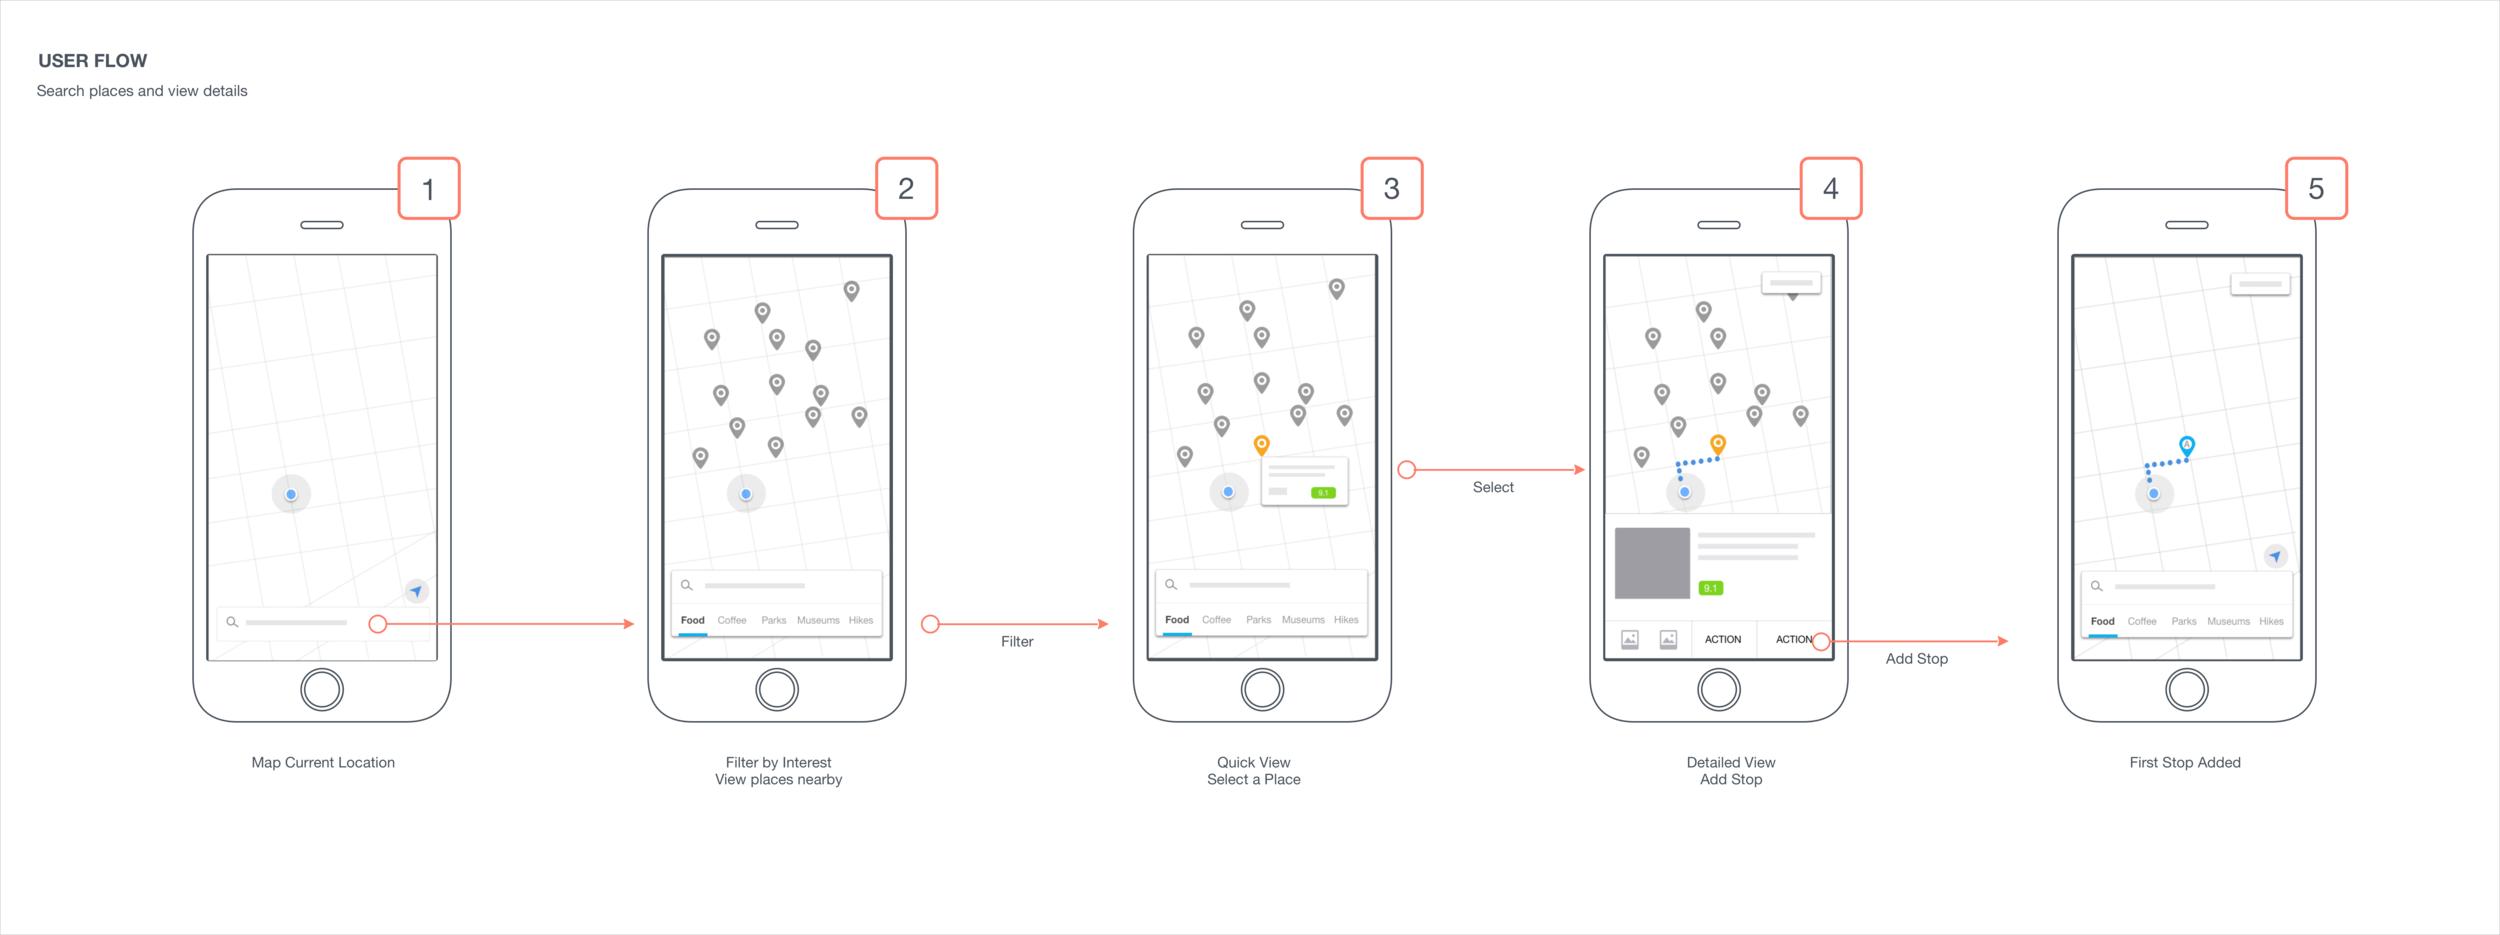 Travel App - Flow Chart.png